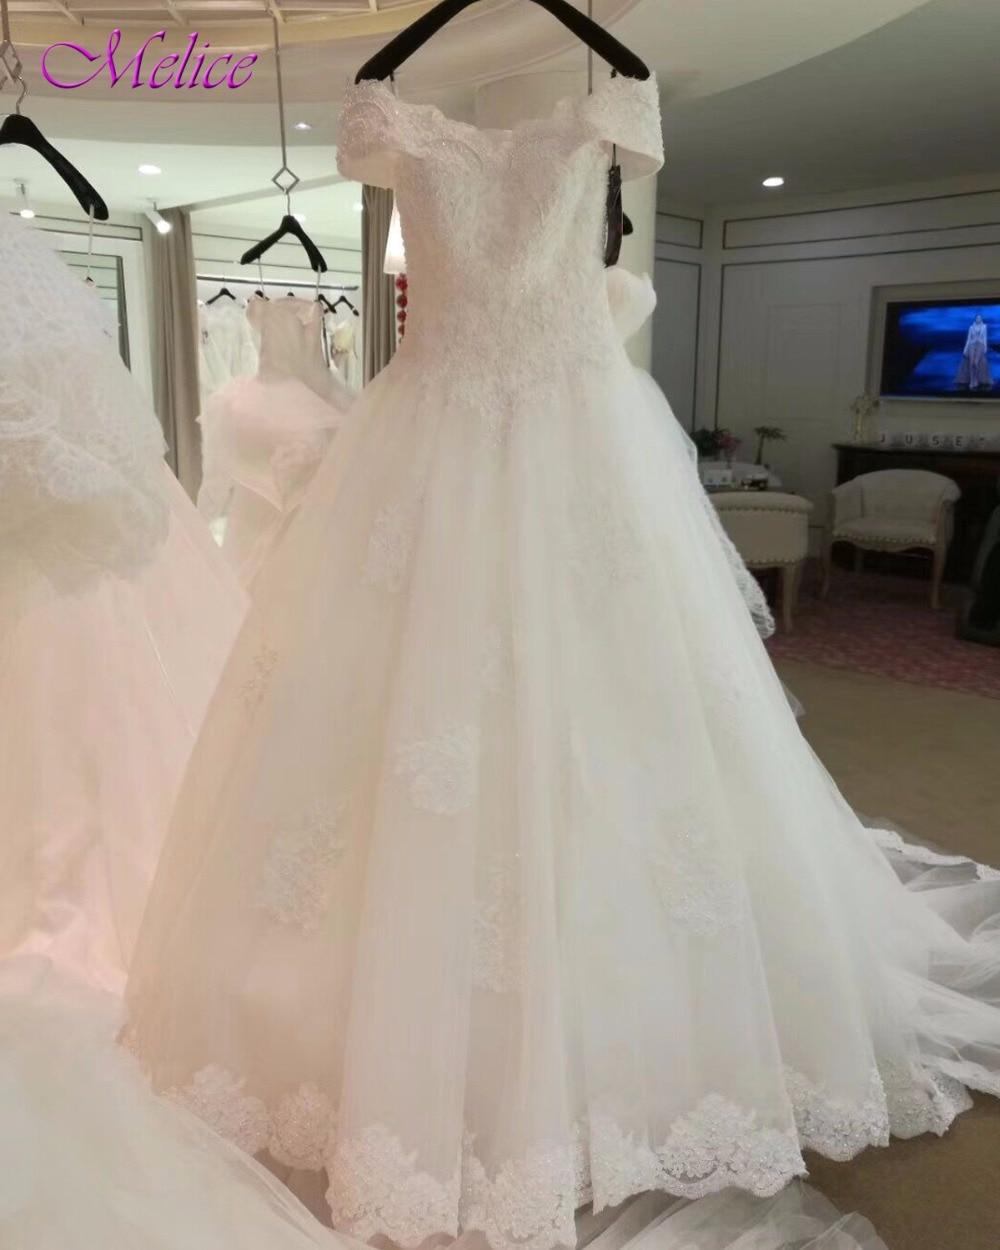 Melice New Gorgeous Appliques Pearls A-Line Wedding Dress 2018 Boat Neck Beaded Lace Up Wedding Gown Vestido de Noiva Plus Size